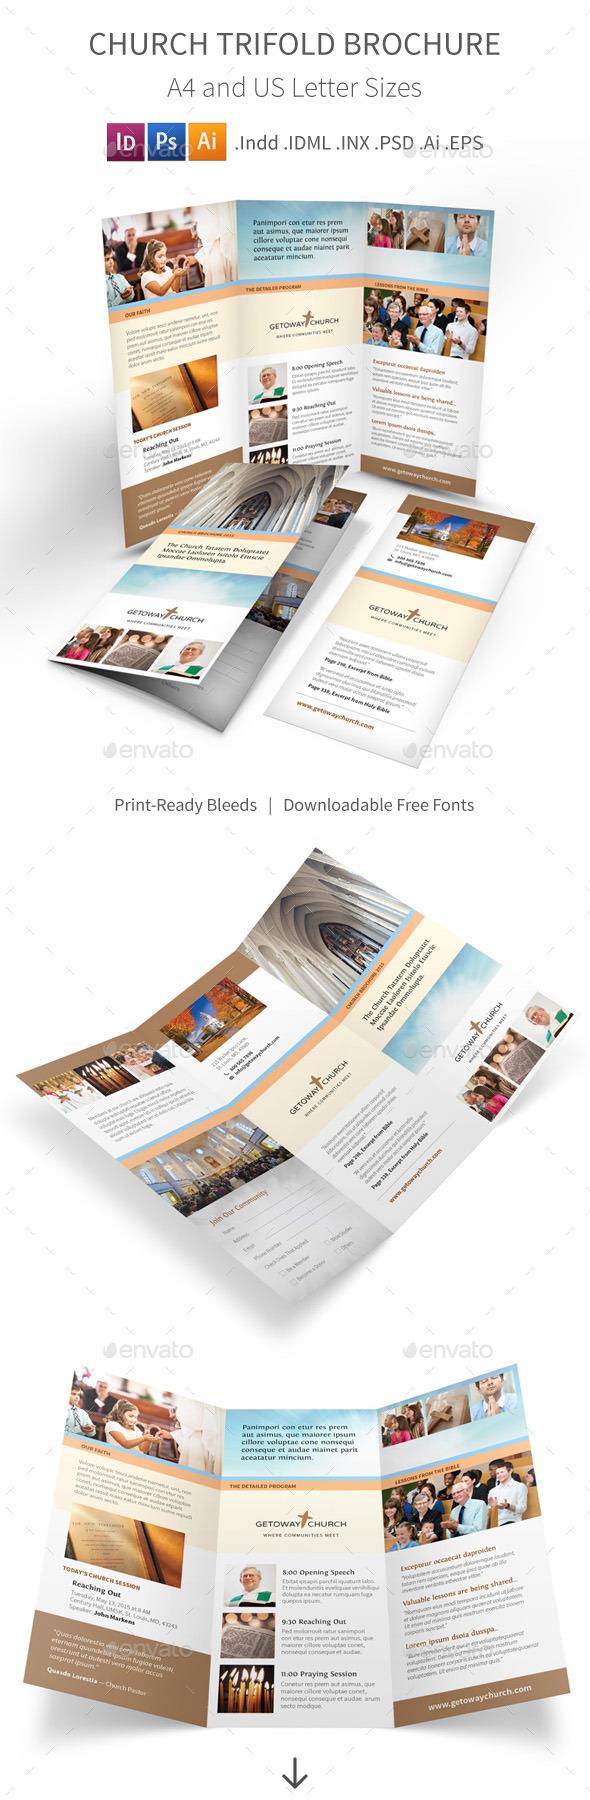 GraphicRiver Church Trifold Brochure 11378390